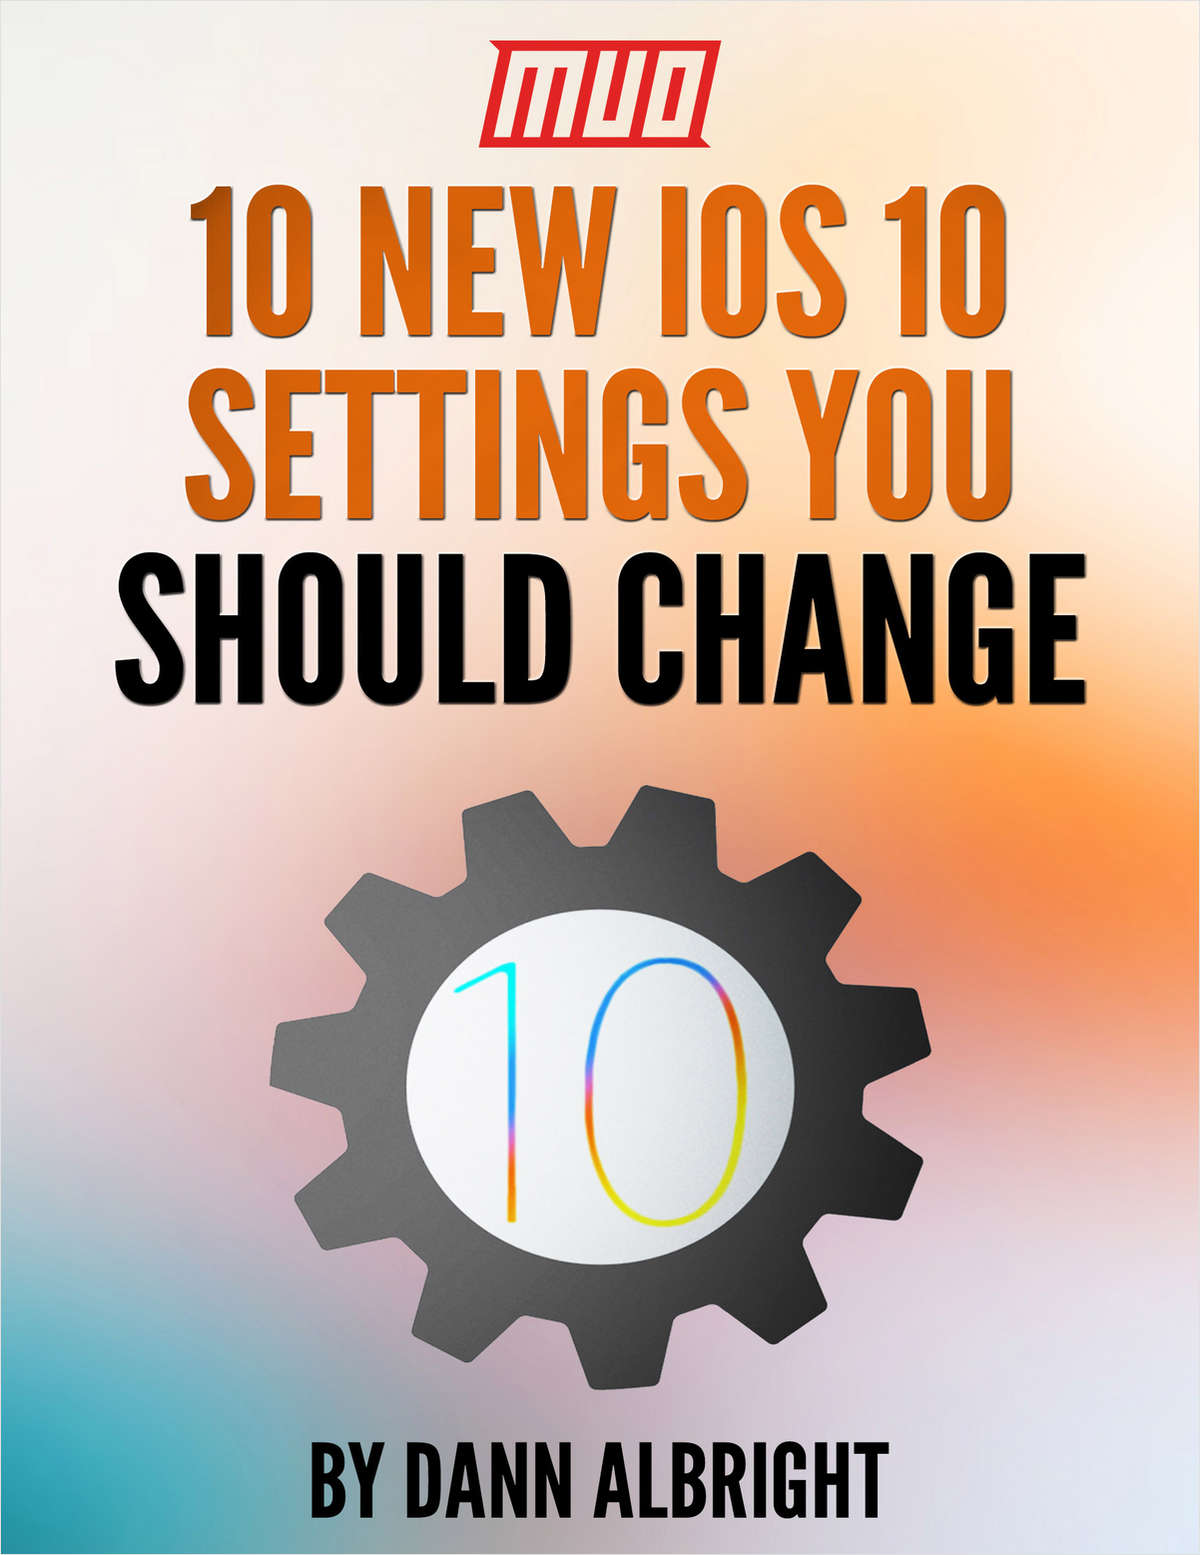 10 New iOS 10 Settings You Should Change